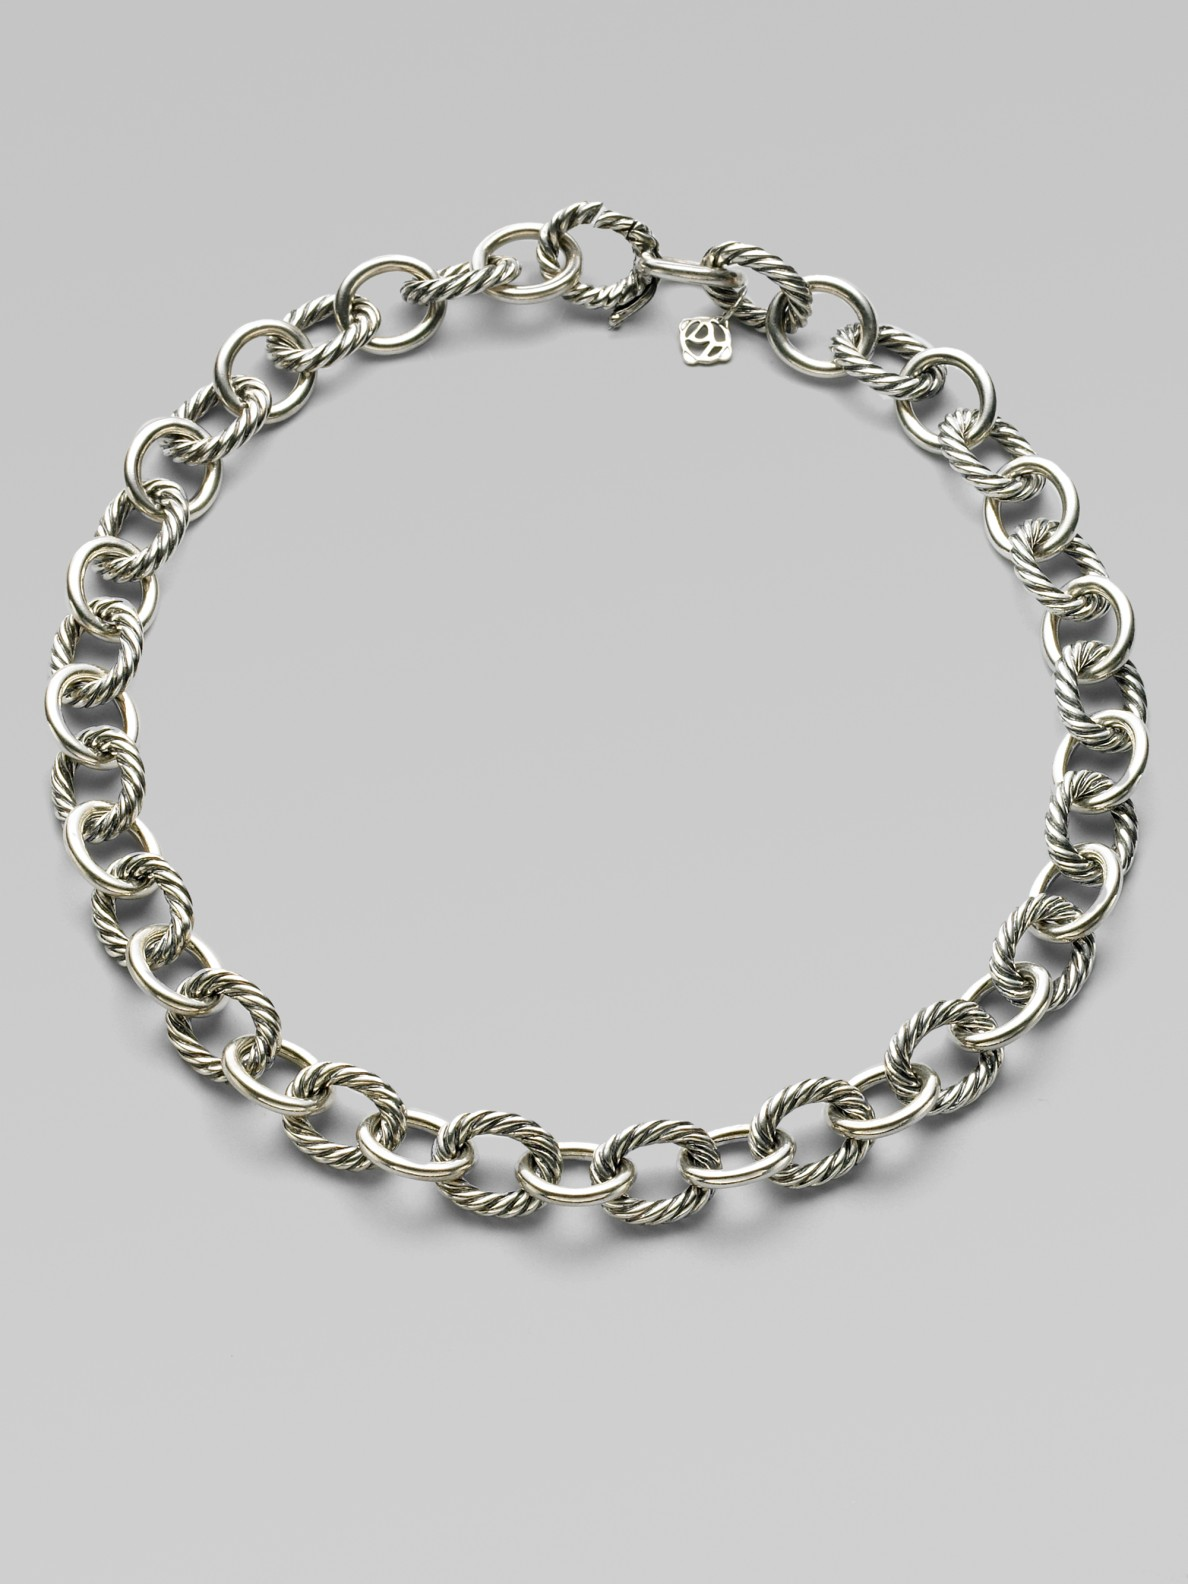 david yurman sterling silver oval link chain necklace in. Black Bedroom Furniture Sets. Home Design Ideas